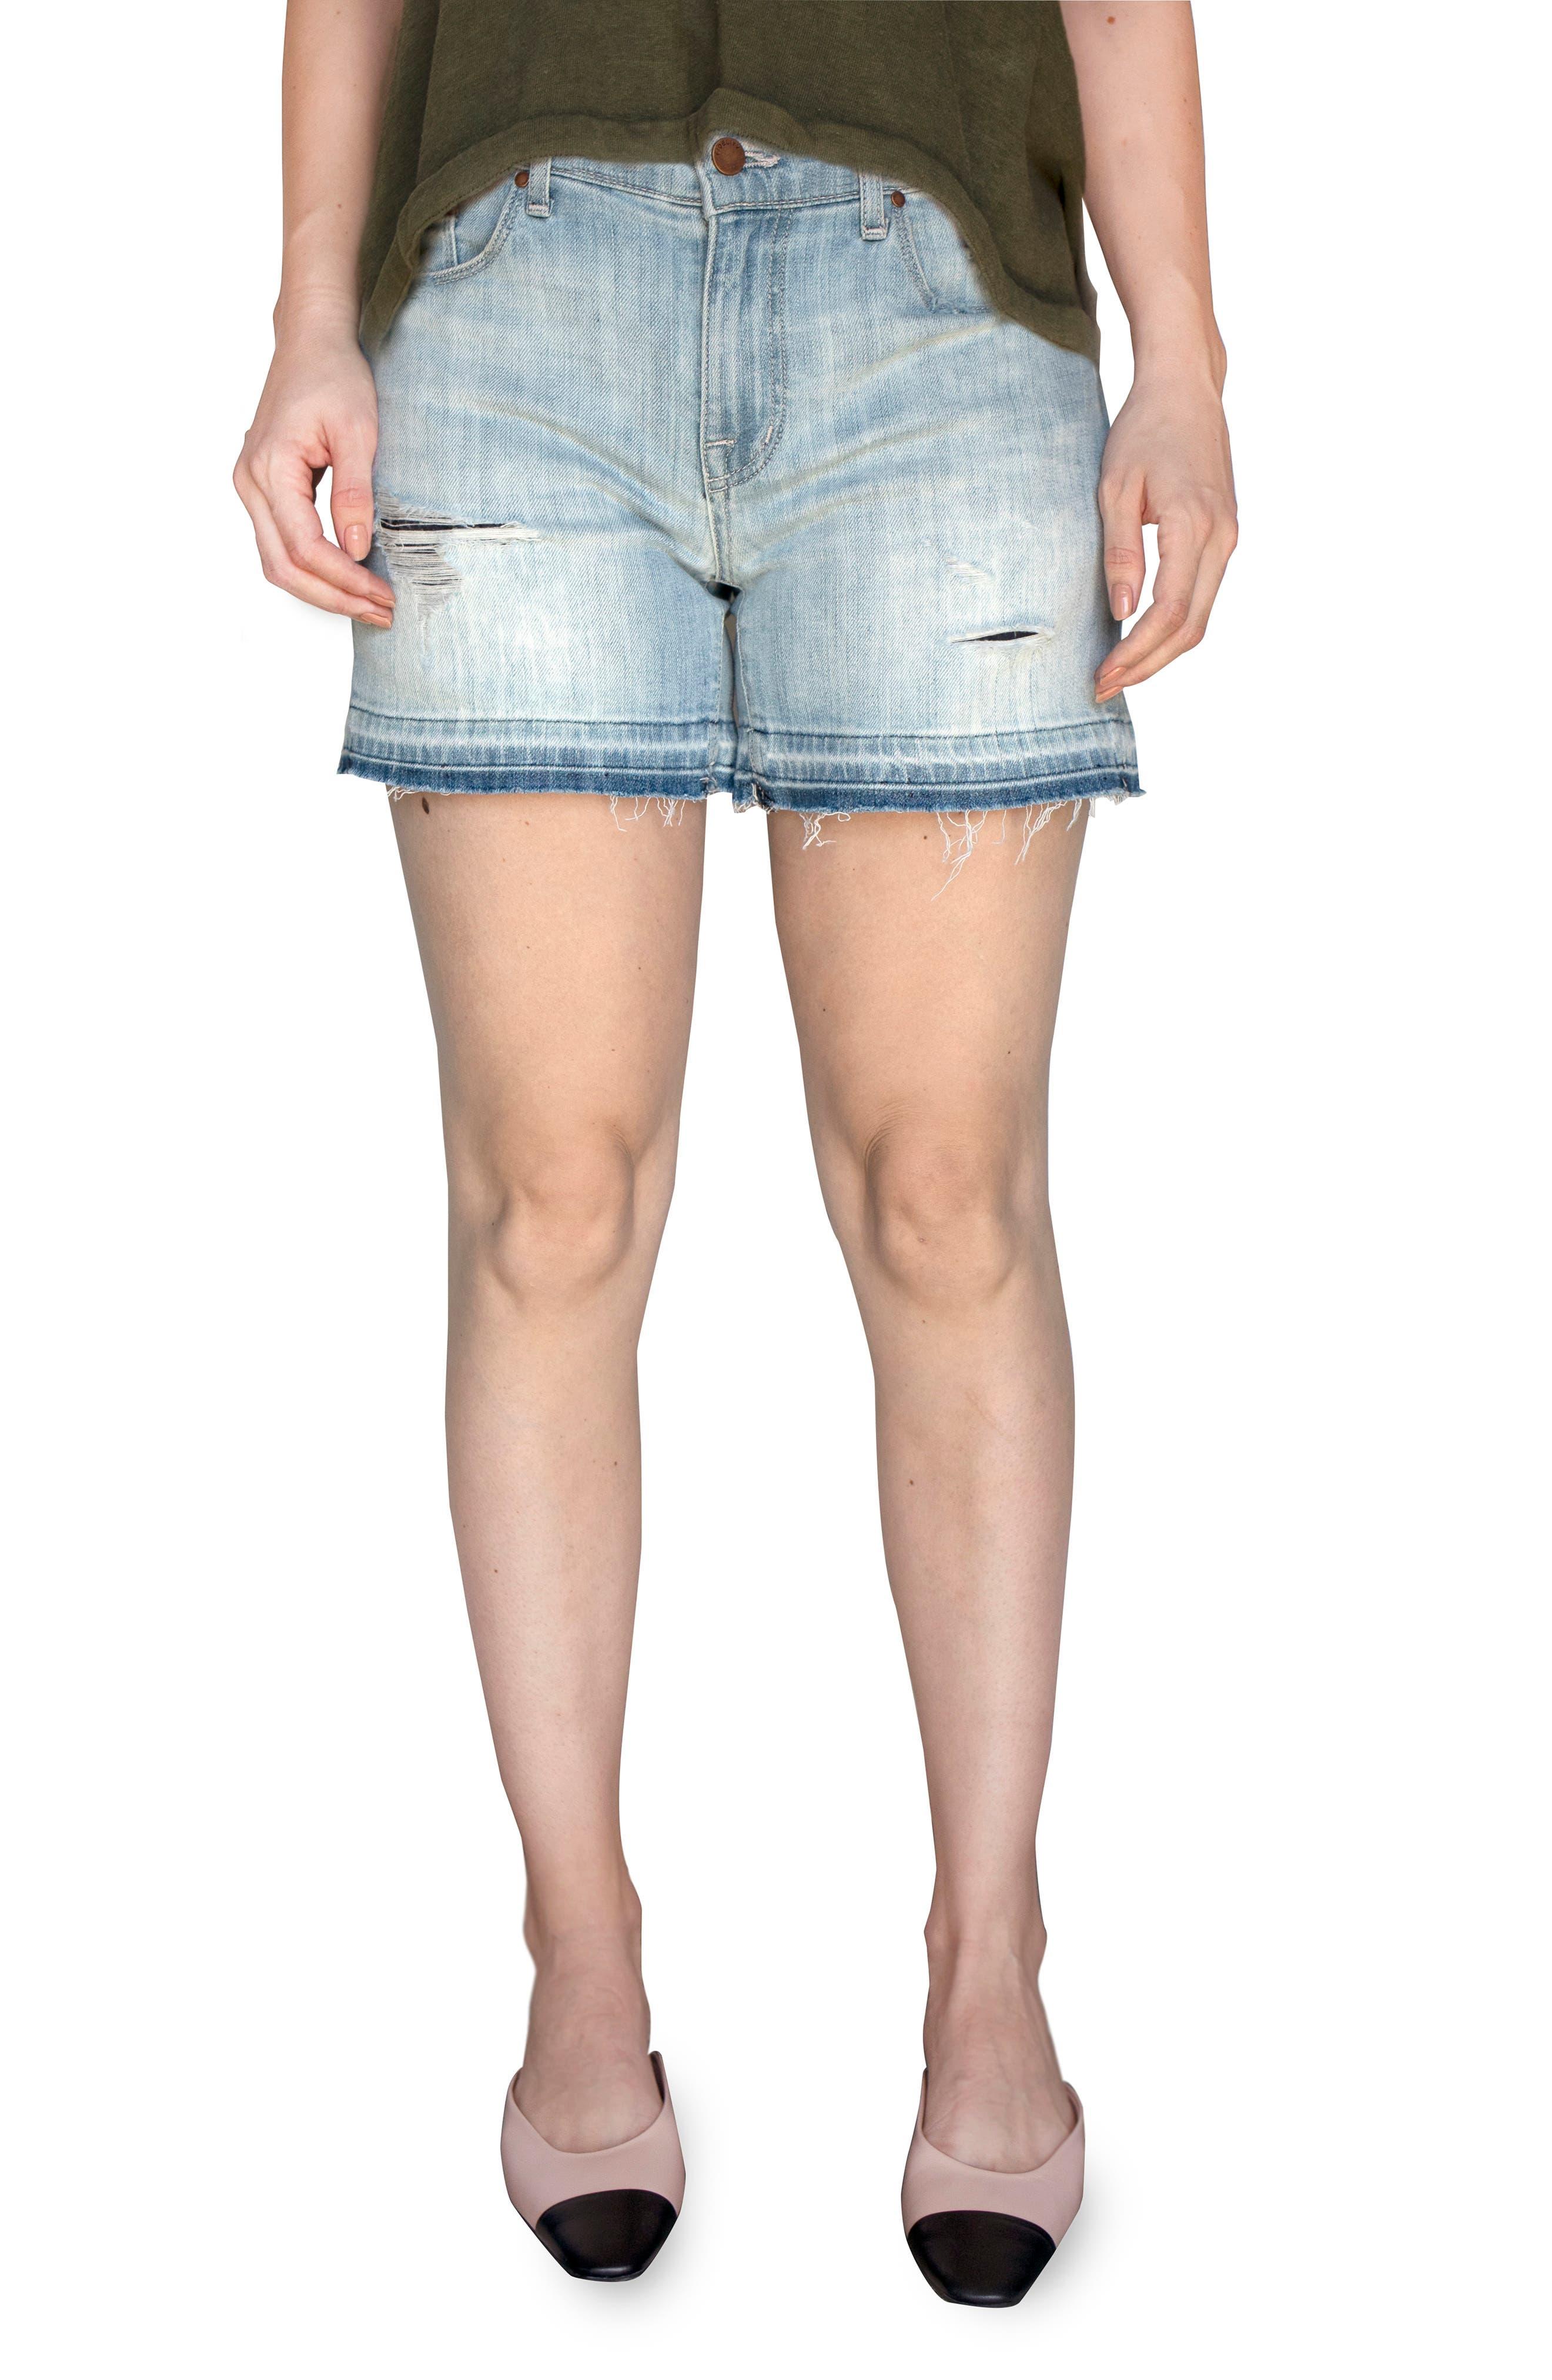 Malibu Ripped Released Raw Hem Denim Shorts